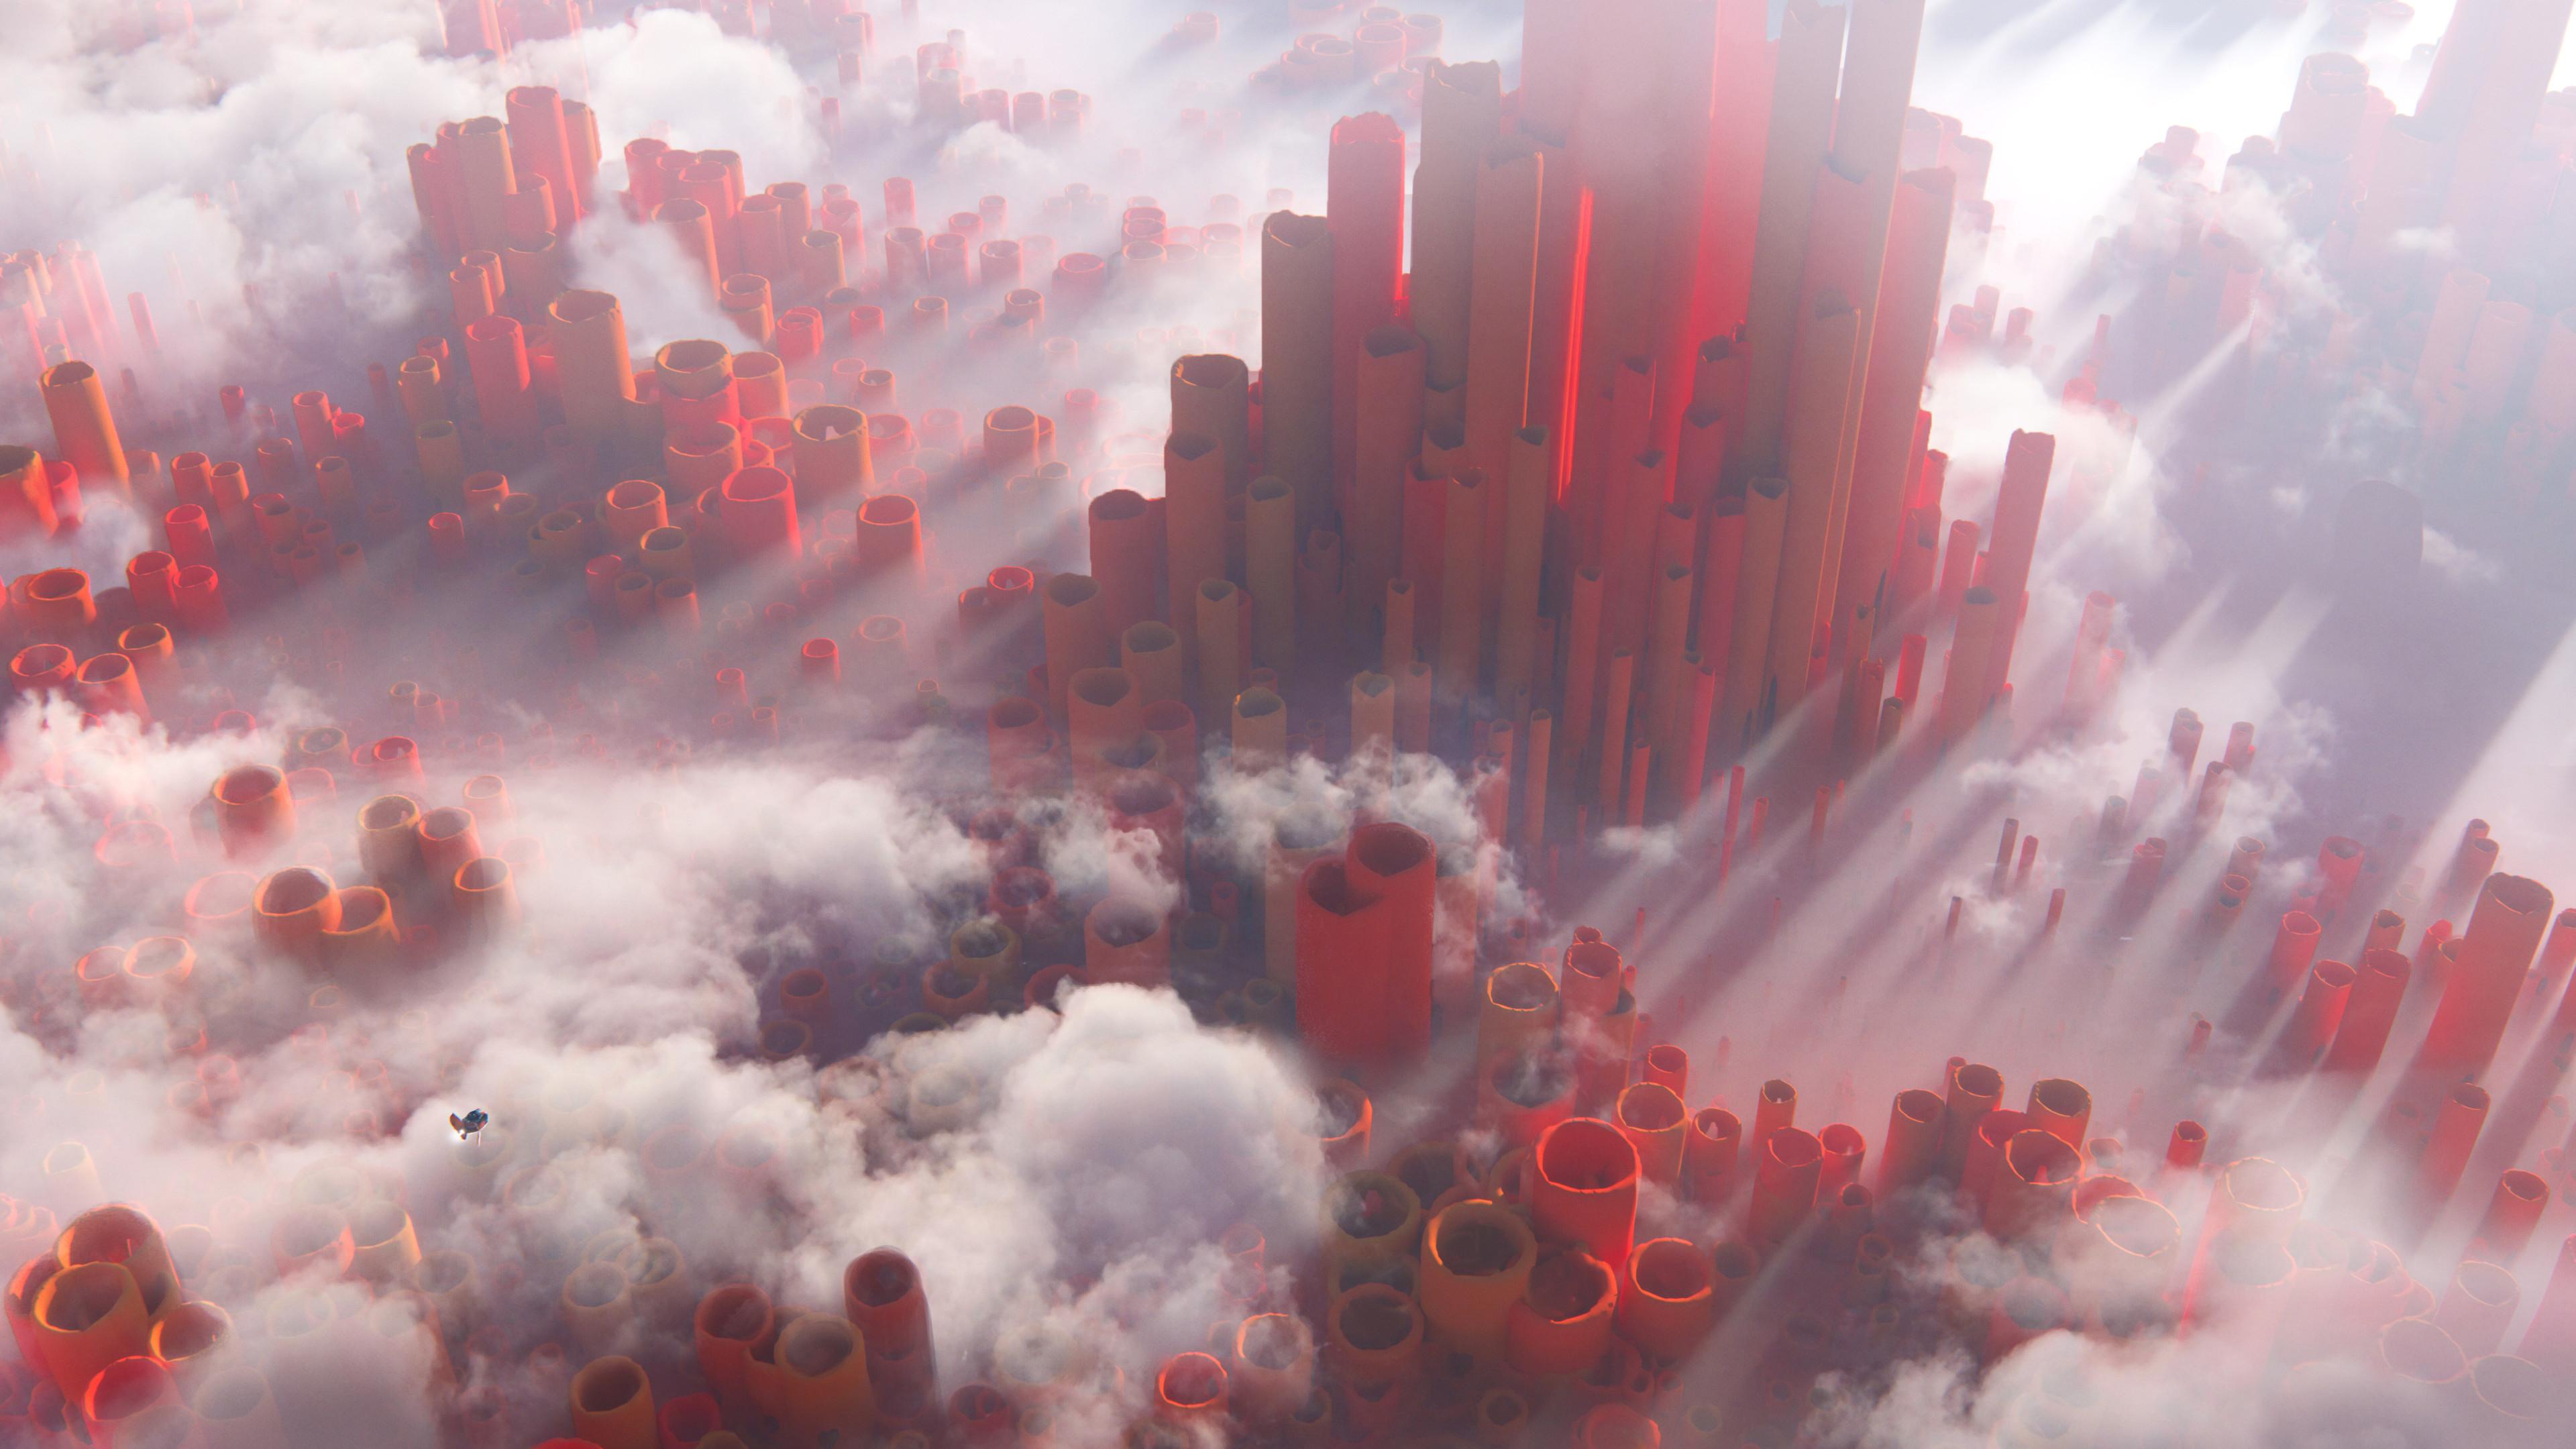 General 3840x2160 Leon Tukker digital art science fiction clouds ship pillar abstract